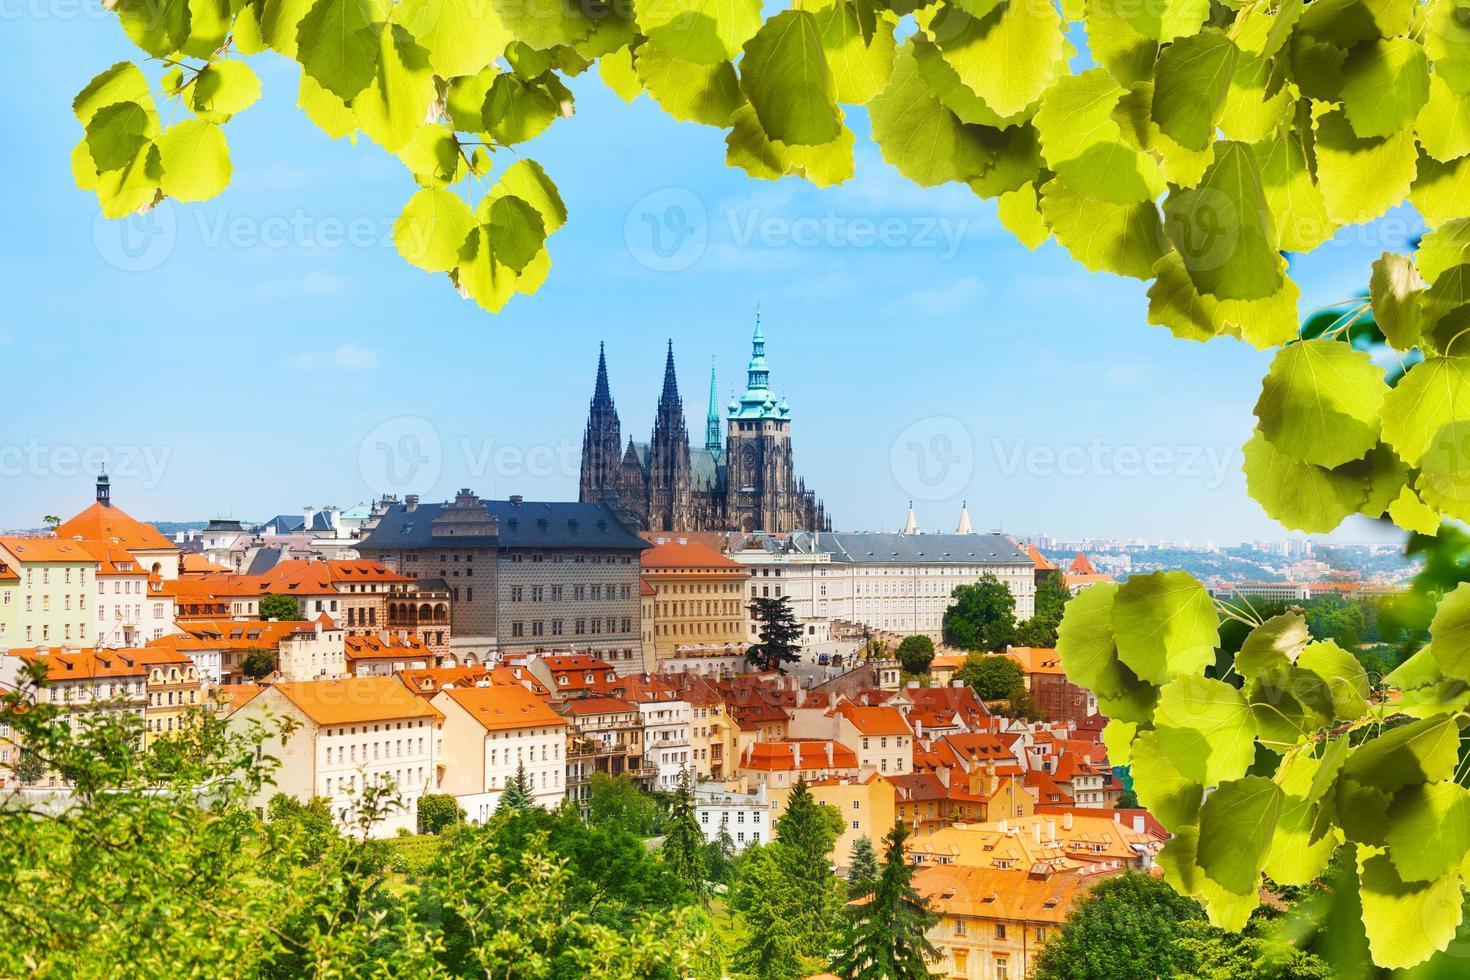 panorama de prague hrad et vitas cathédrale photo